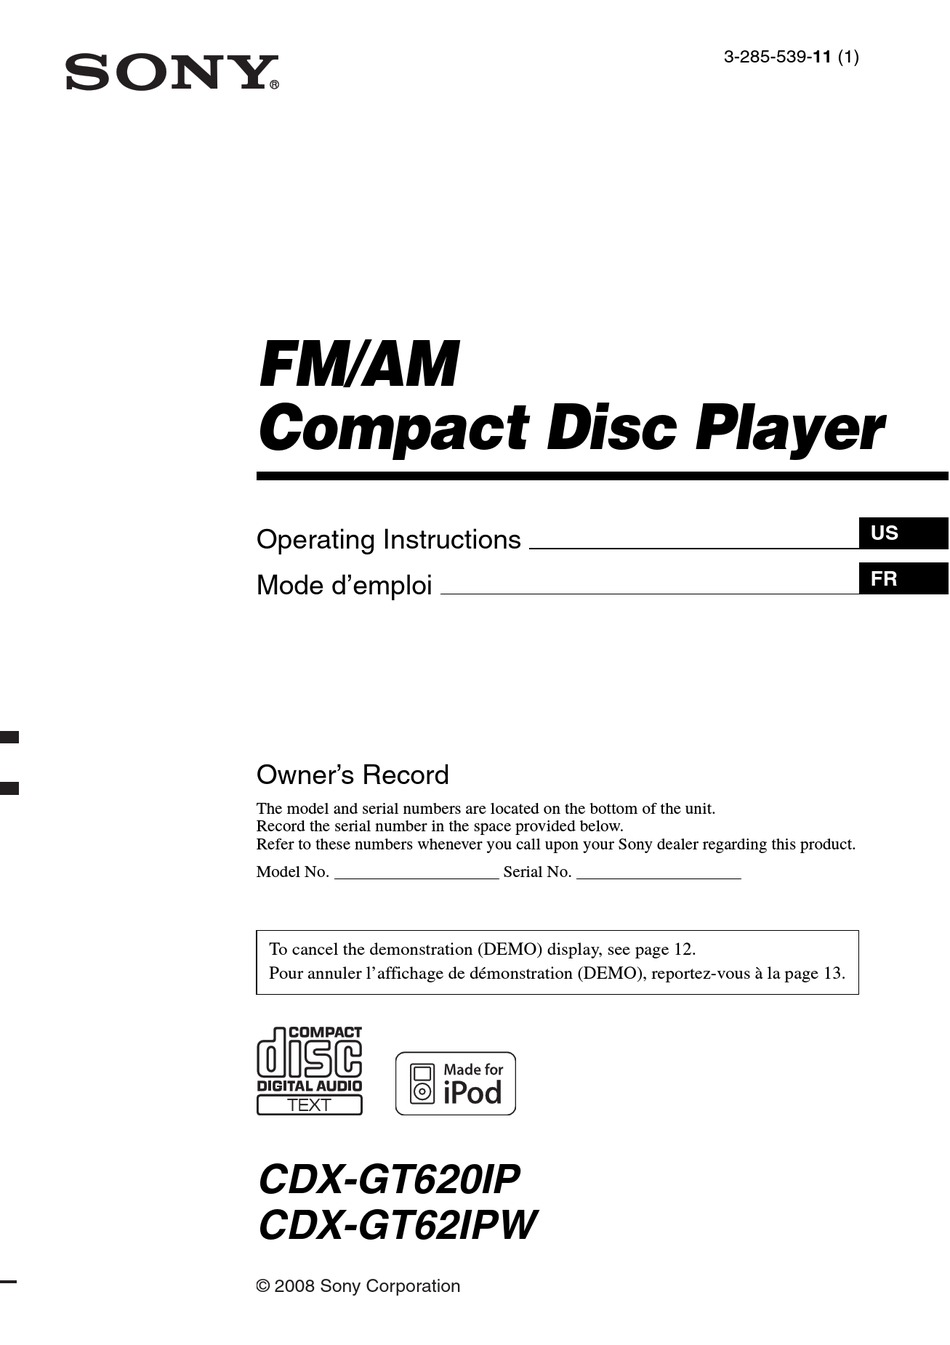 Sony Cdx Gt660Up Wiring Diagram from data2.manualslib.com